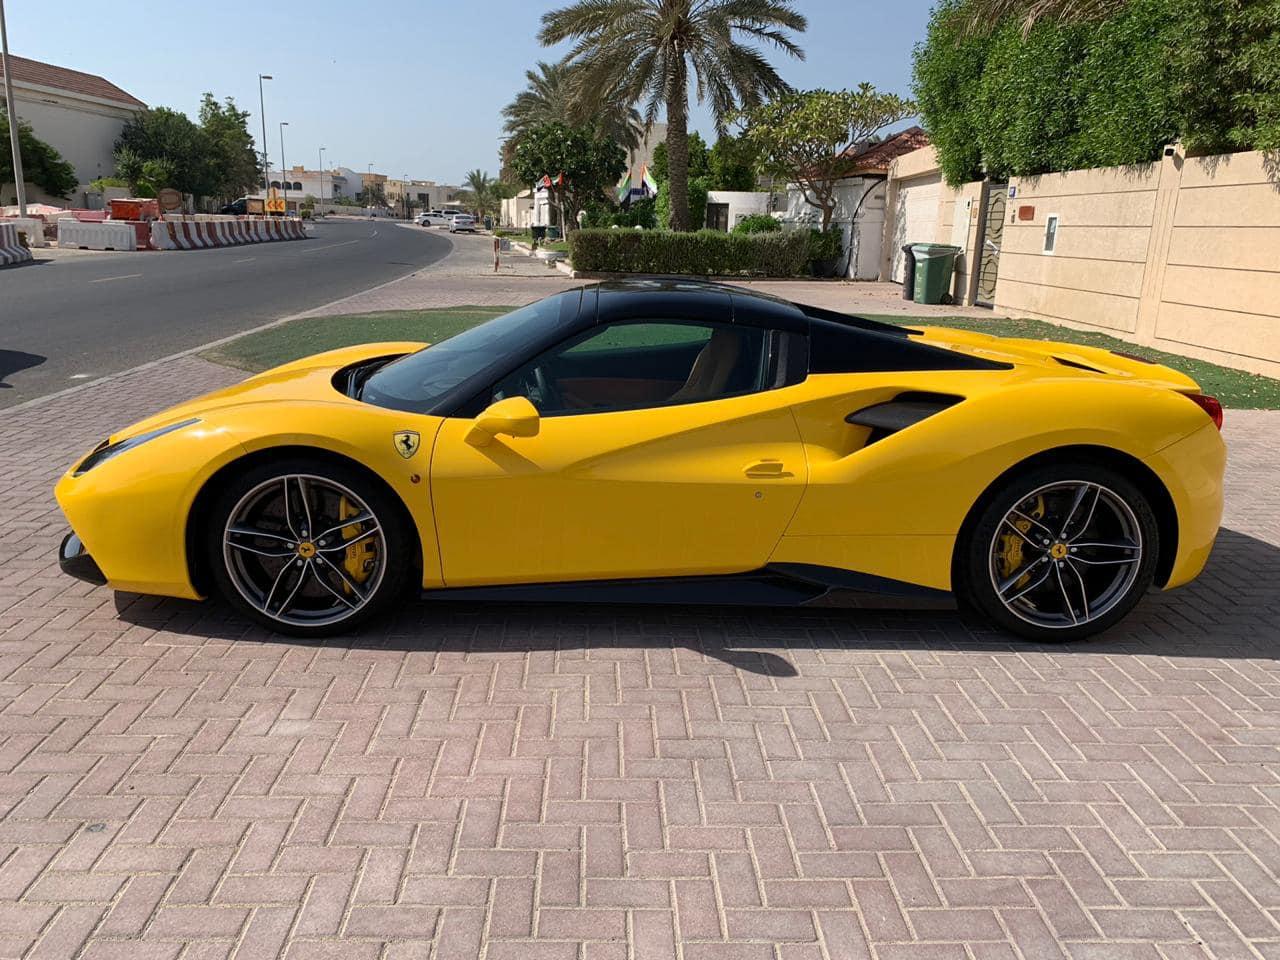 siêu xe Ferrari cho đại gia mới nổi